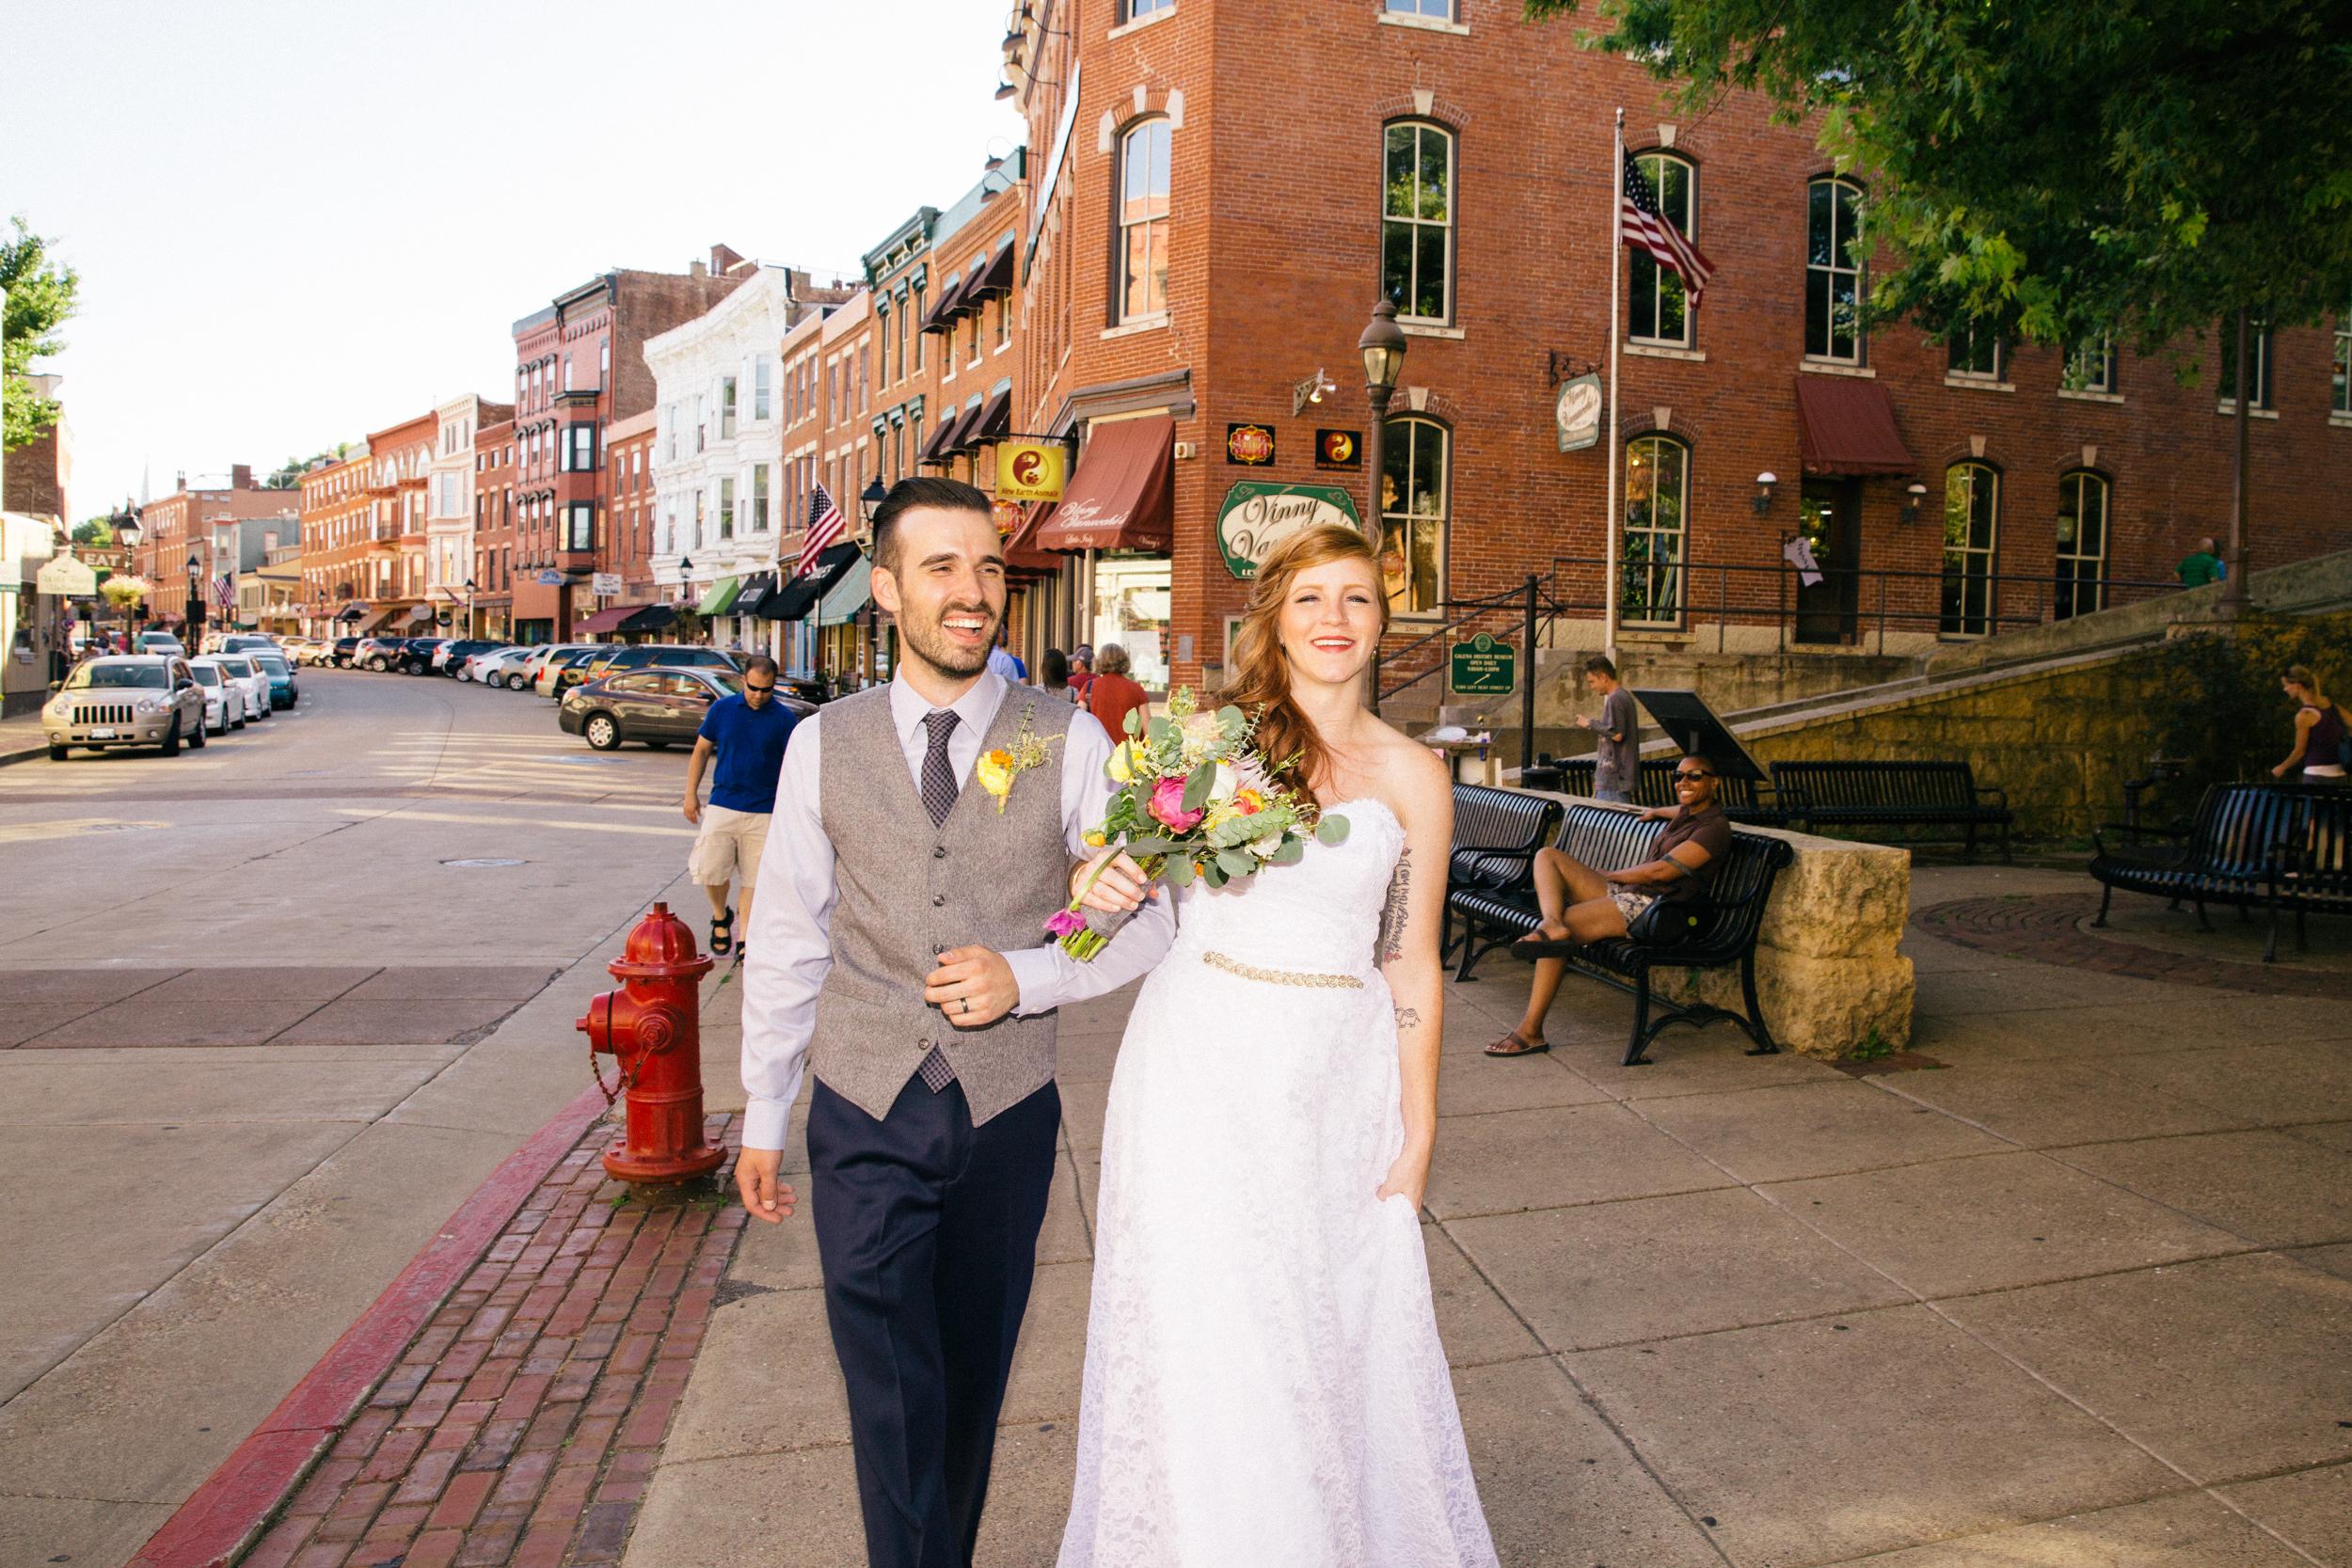 7-25-2015 Sarah and Jimmy's Eagle Ridge Downtown Galena Wedding-180.jpg